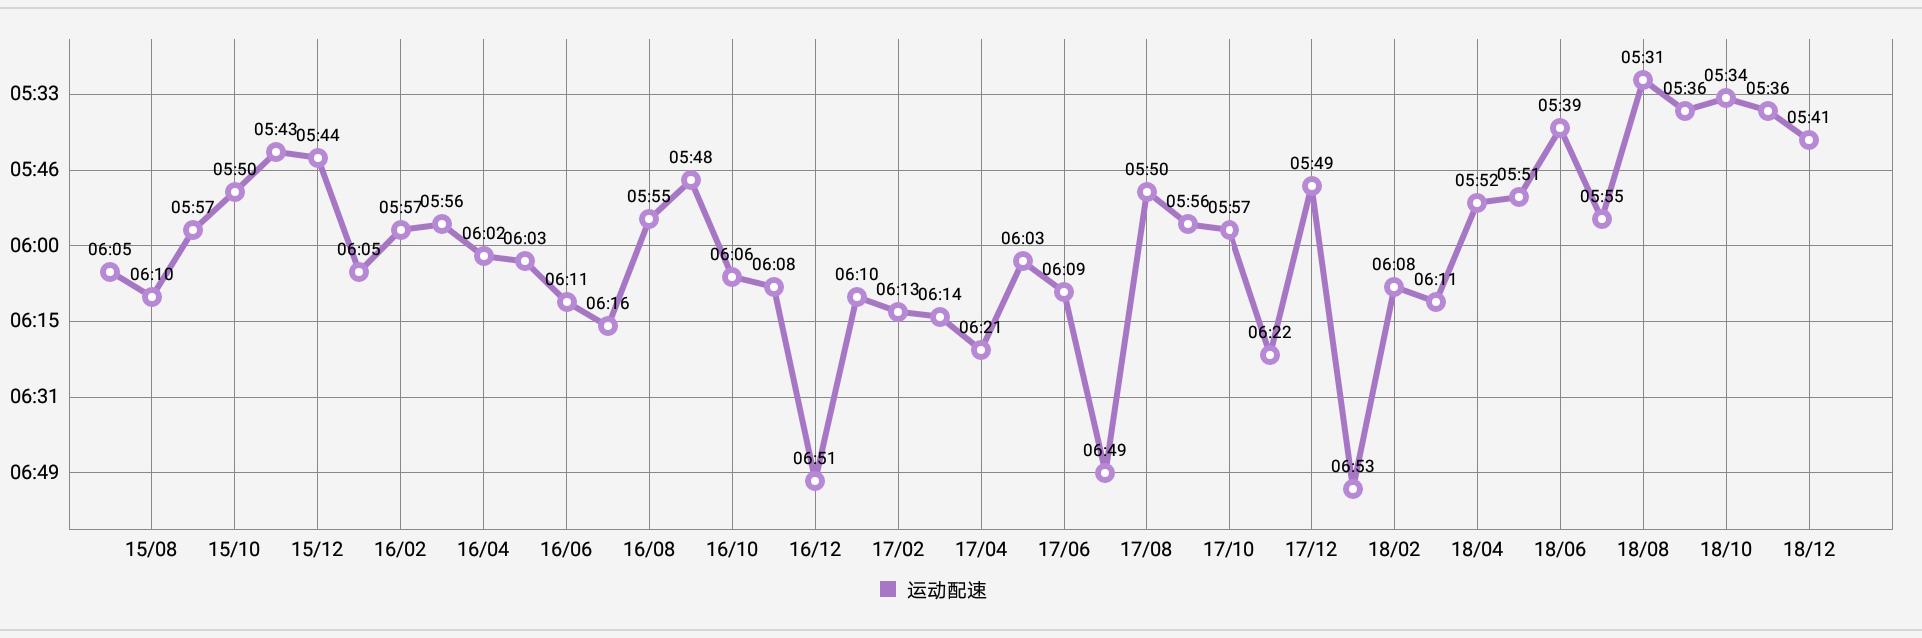 2015-2018年度跑步配速